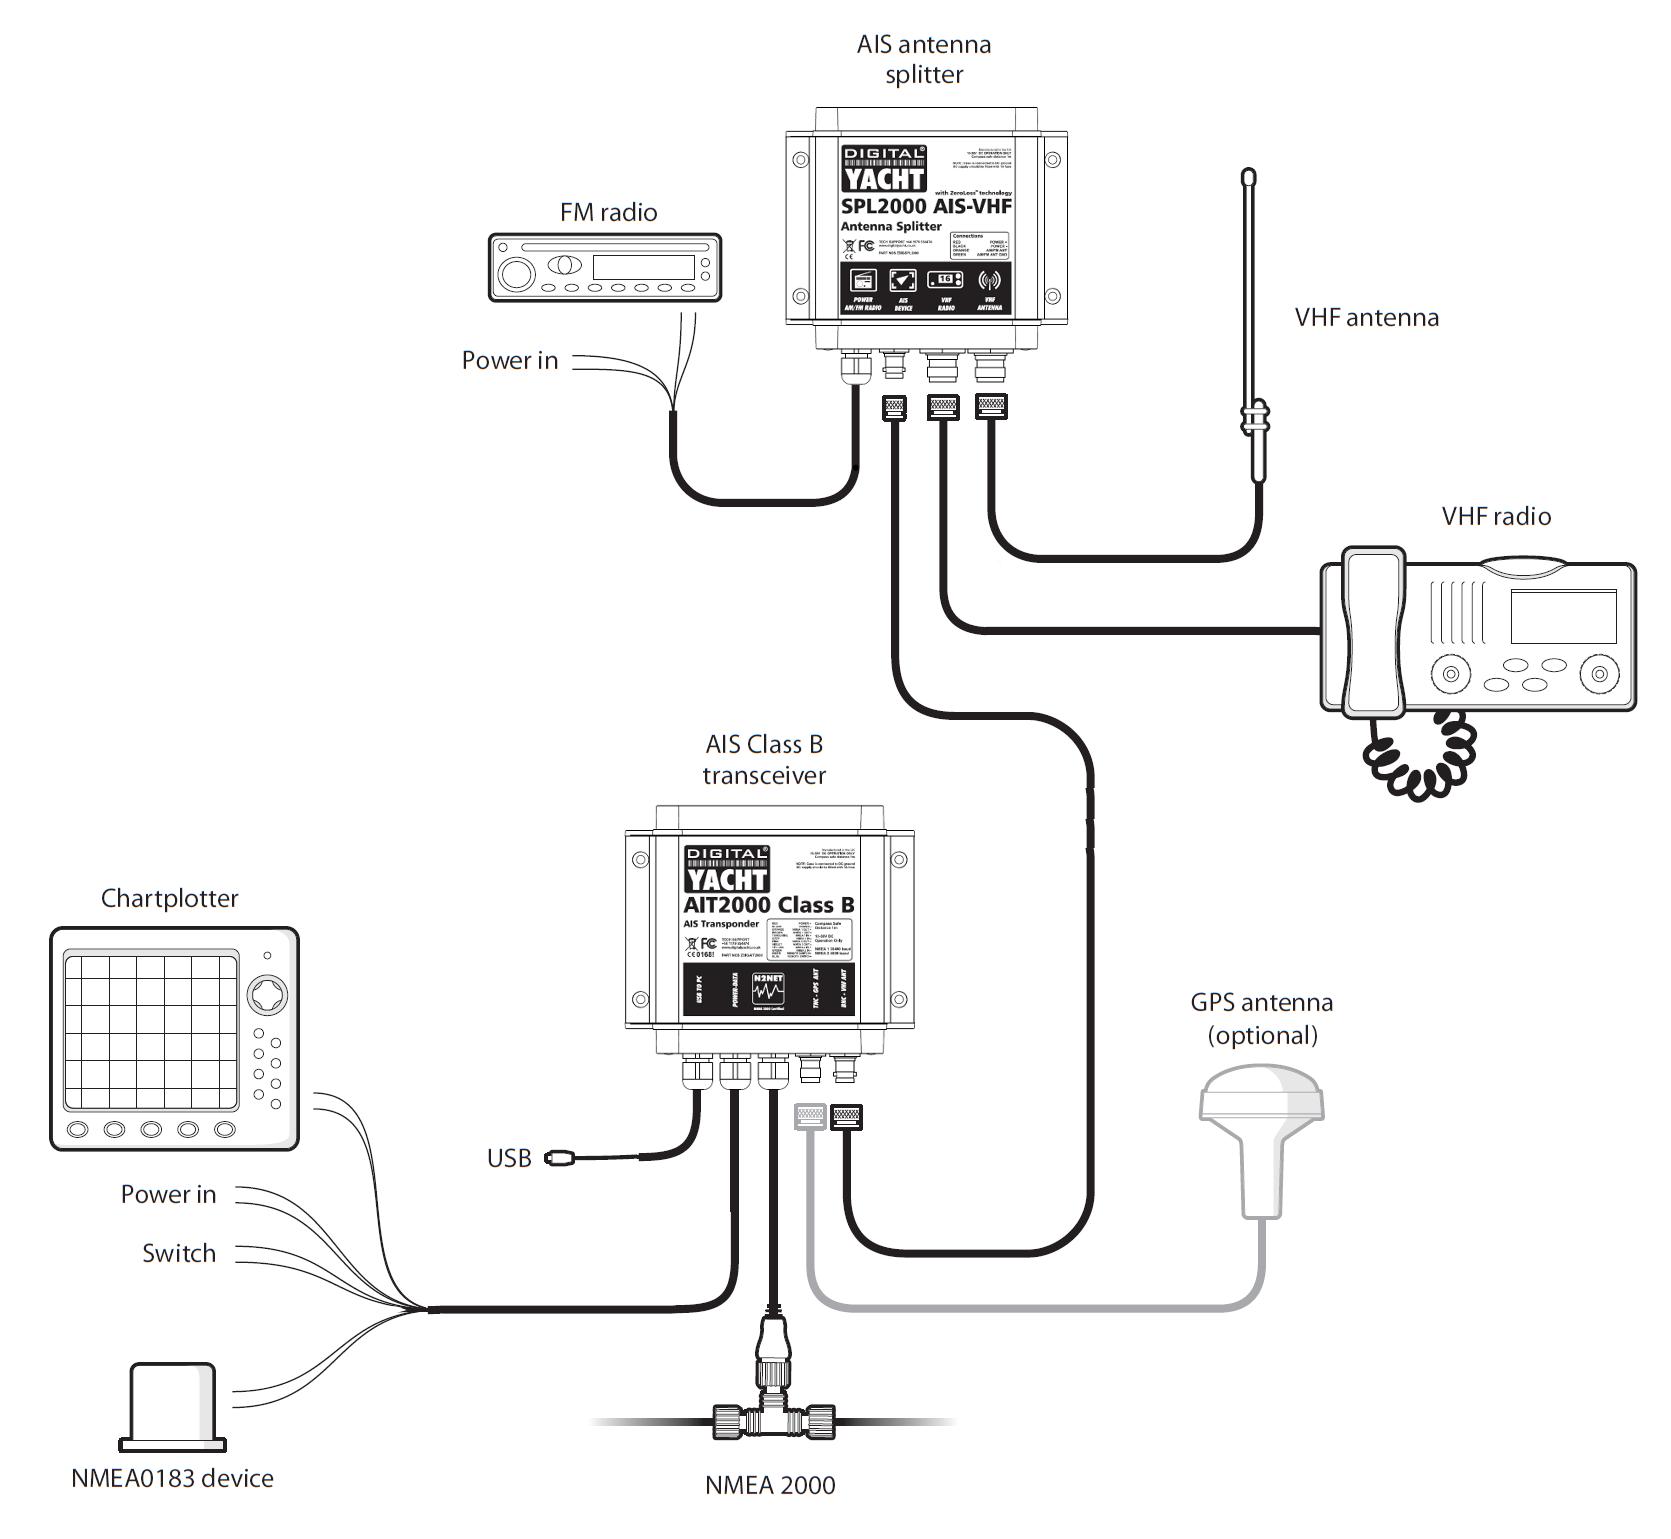 [DIAGRAM_38ZD]  MH_0608] Ais Gps Wiring Diagram Wiring Diagram   Ais Gps Wiring Diagram      Neph Sarc Bedr Cette Mohammedshrine Librar Wiring 101